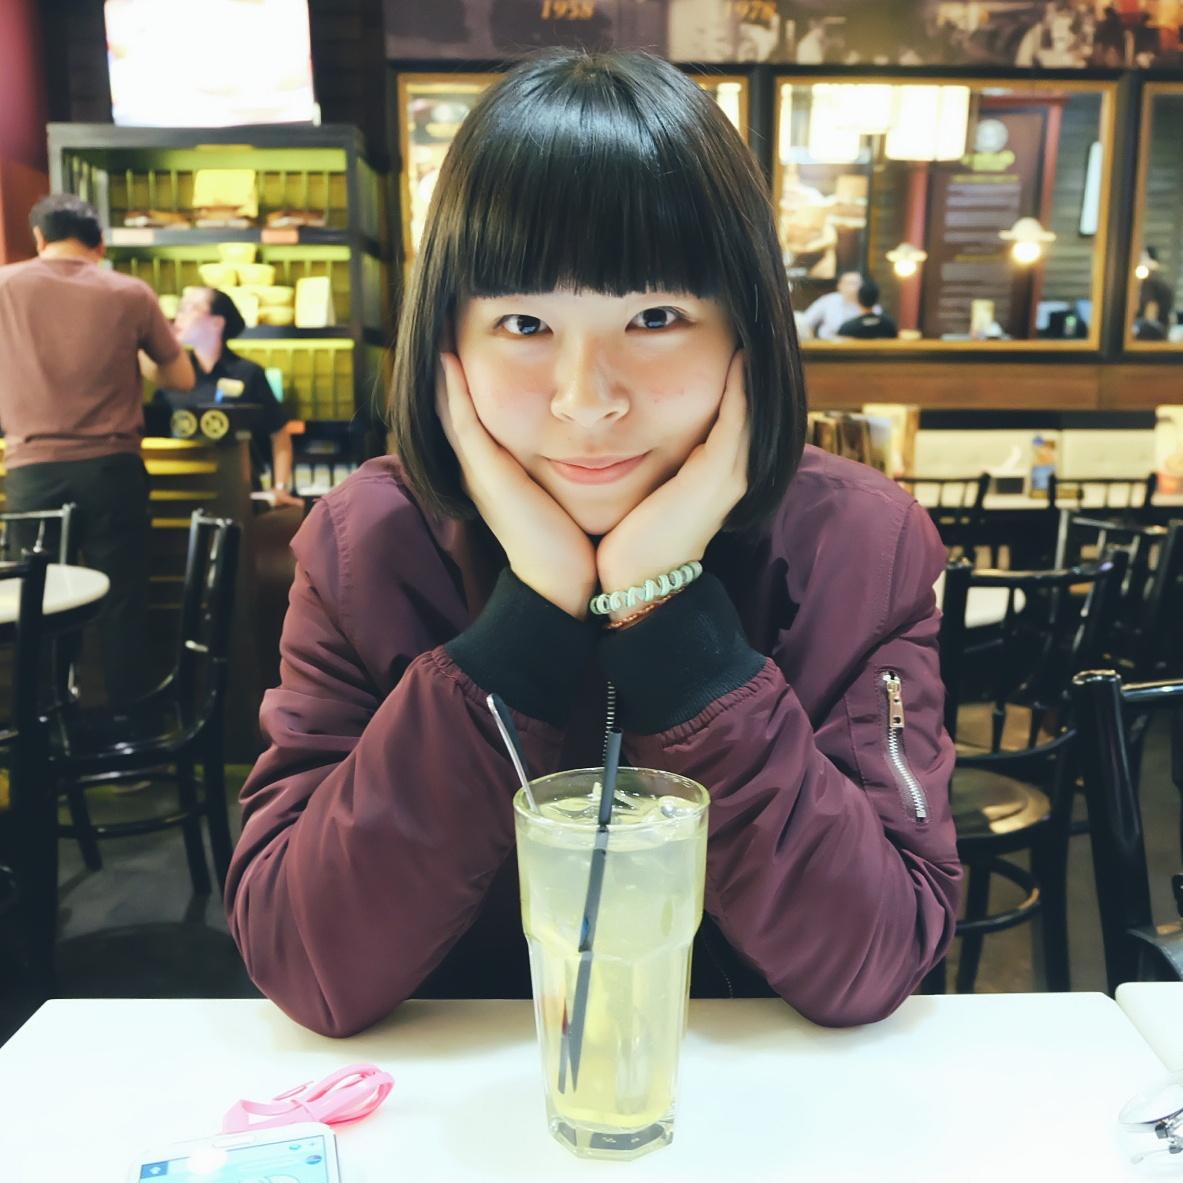 life update - short hairstyle | japobsganbare.blogspot.com